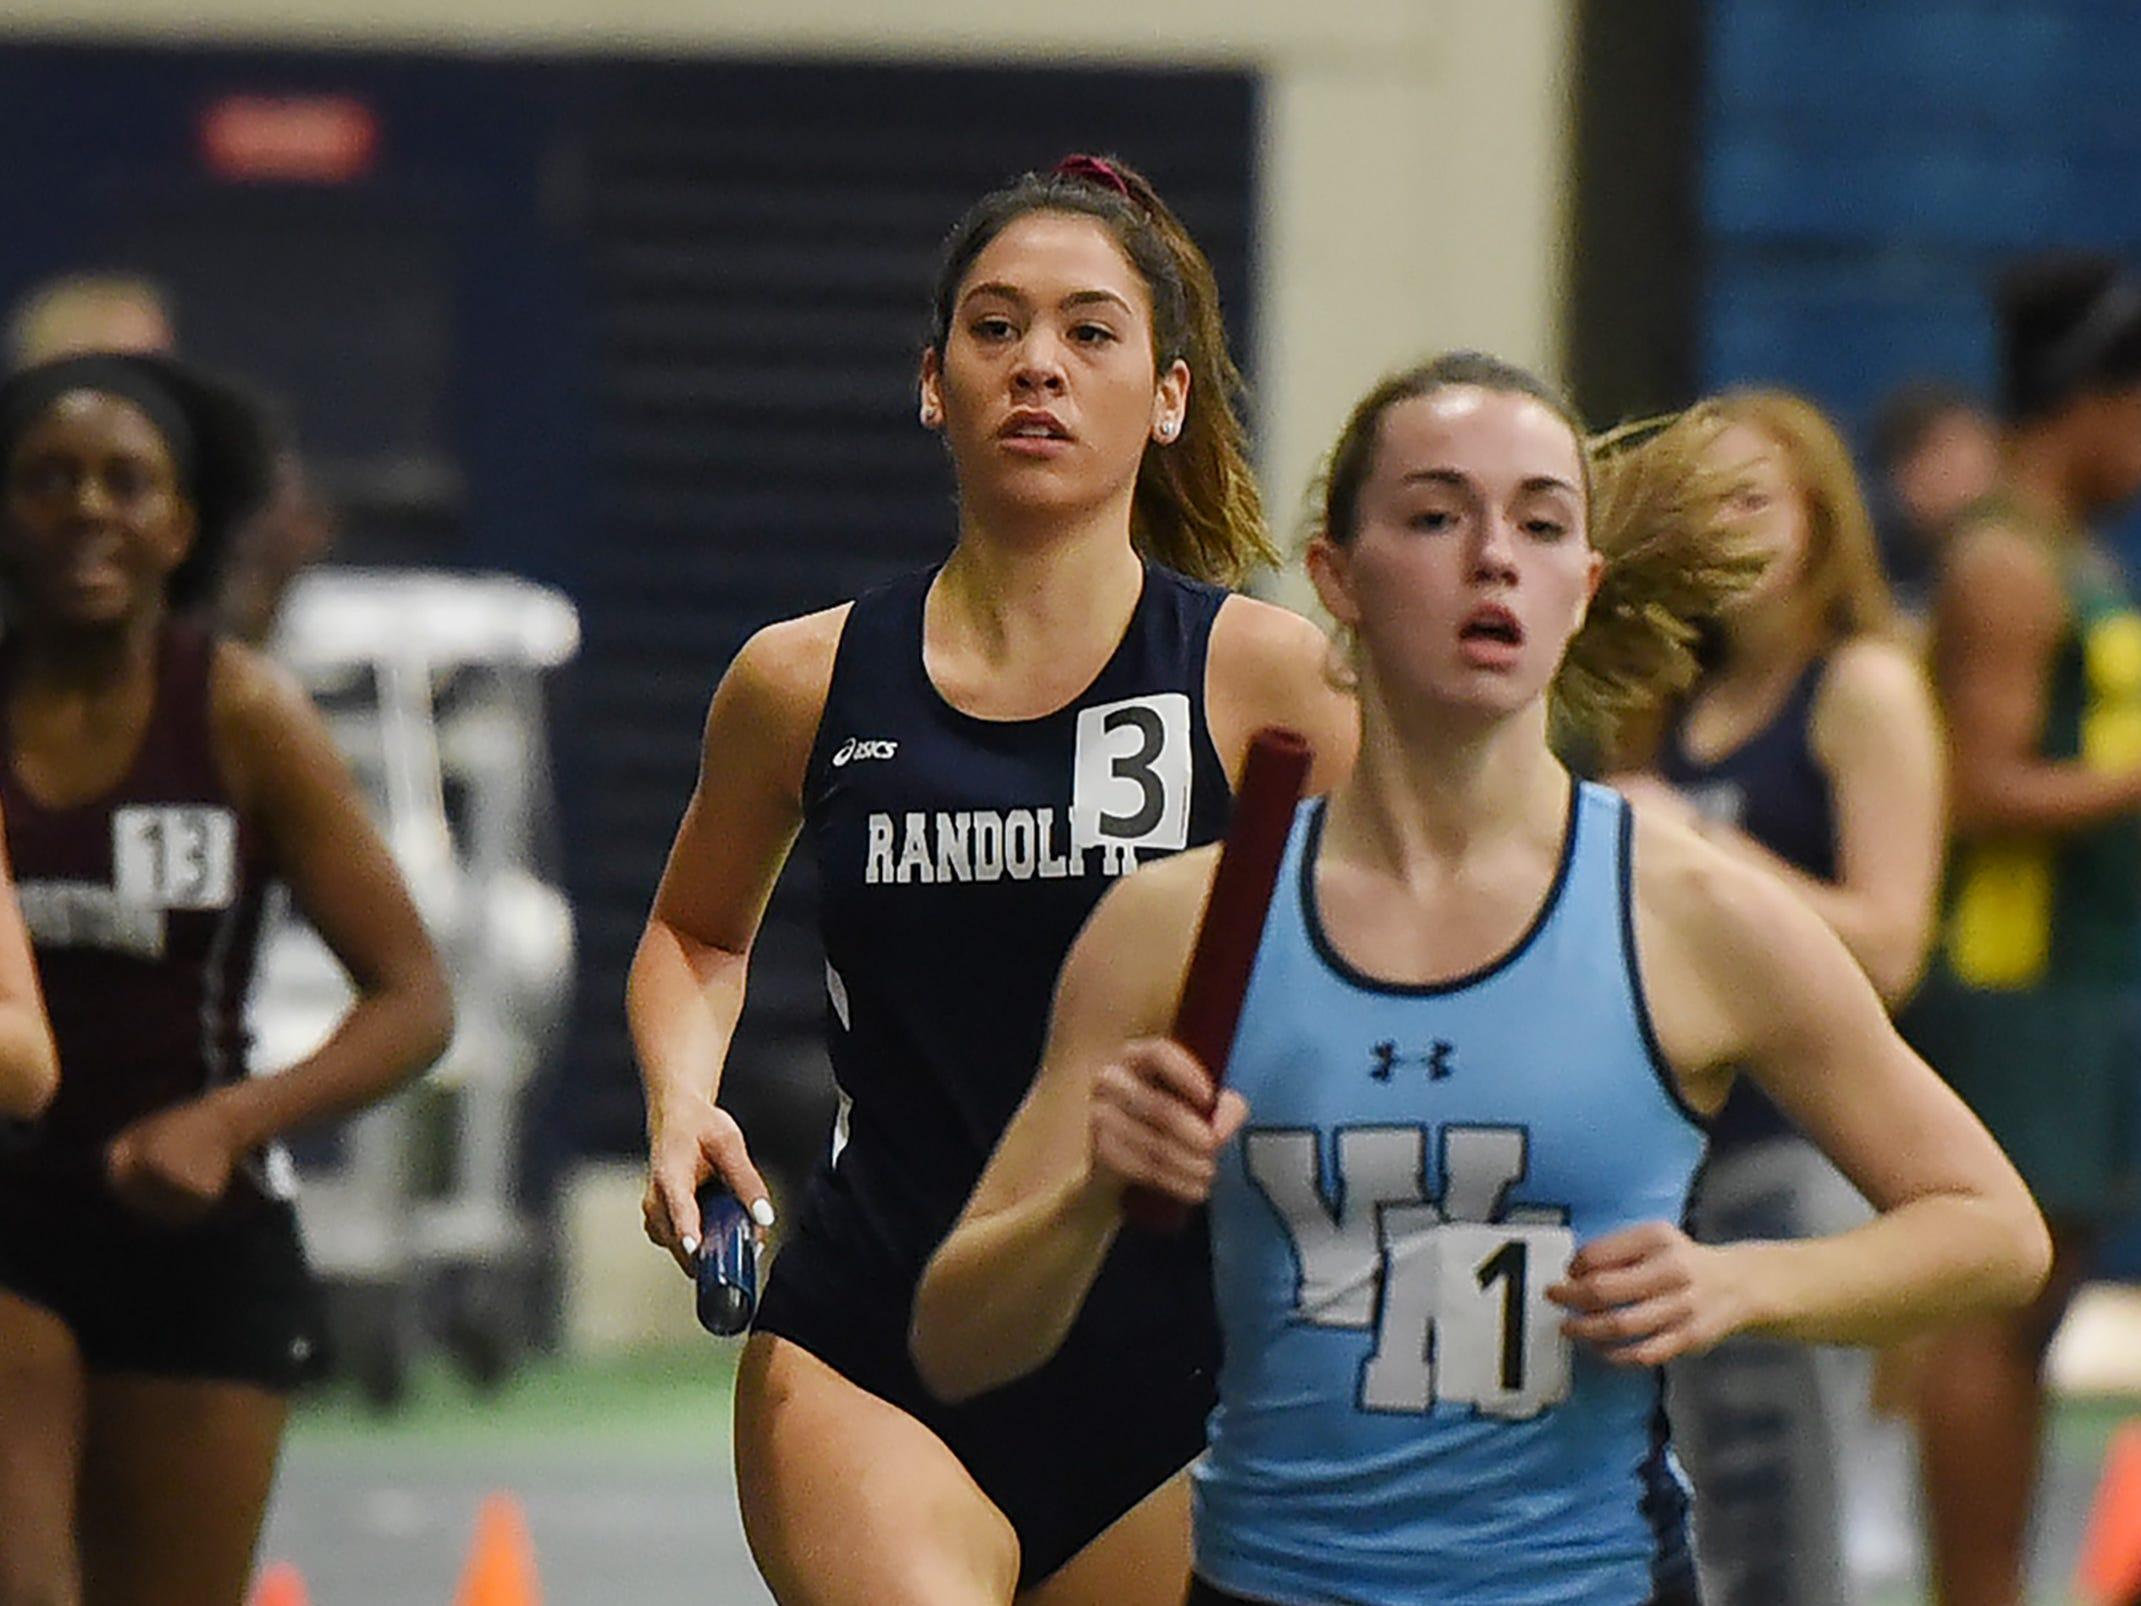 Amanda Houston (C) runs the 800-meter leg of Randolph's distance medley at Morris County Relays at Drew University in Madison on 01/09/19.